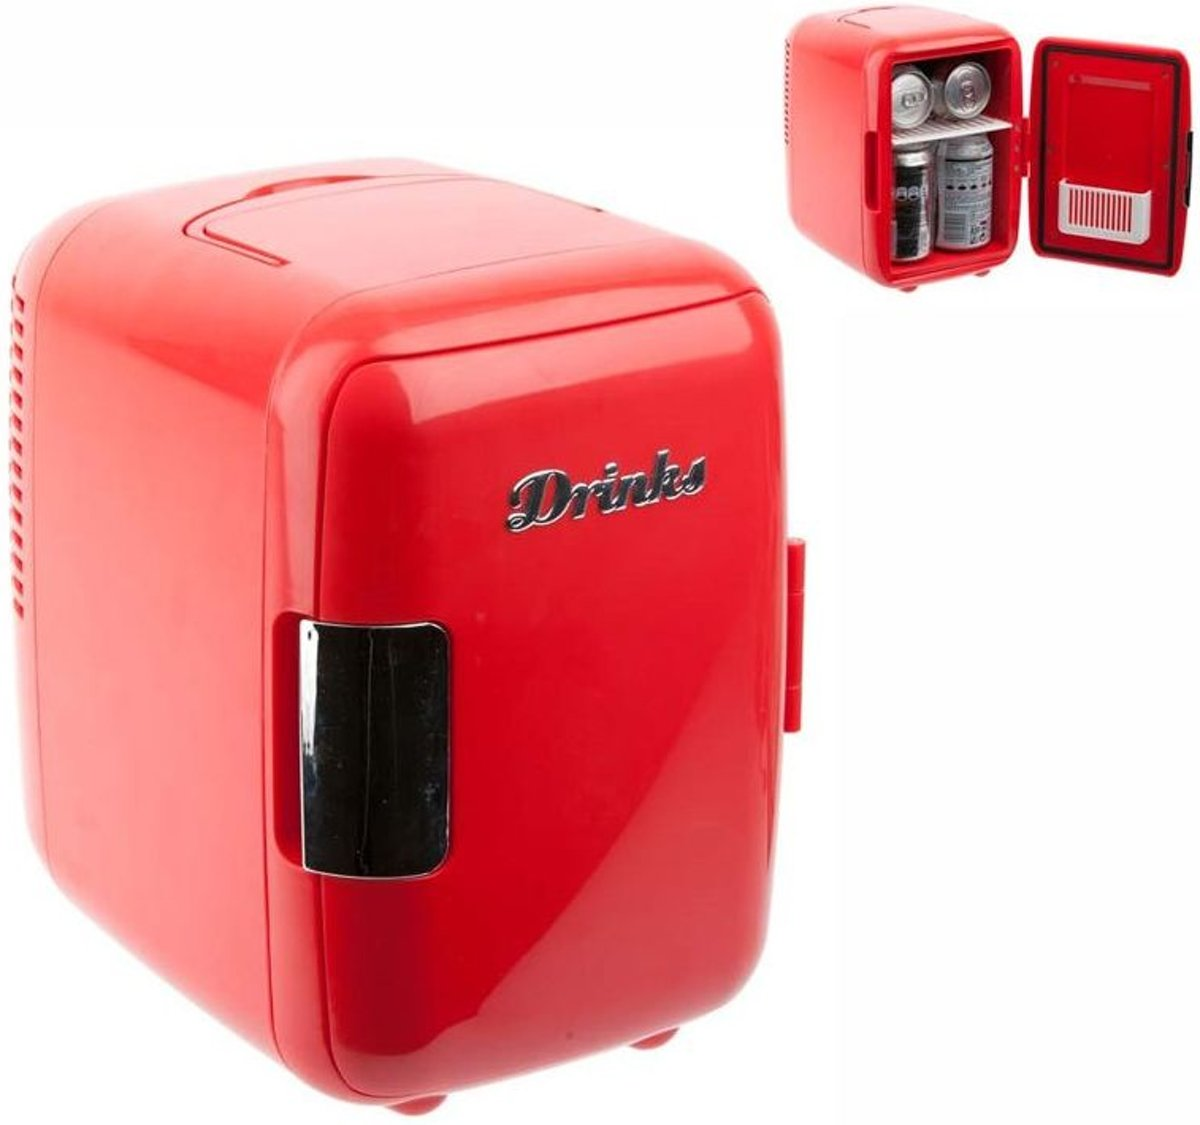 Balvi mini koelkast Drinks - Rood kopen